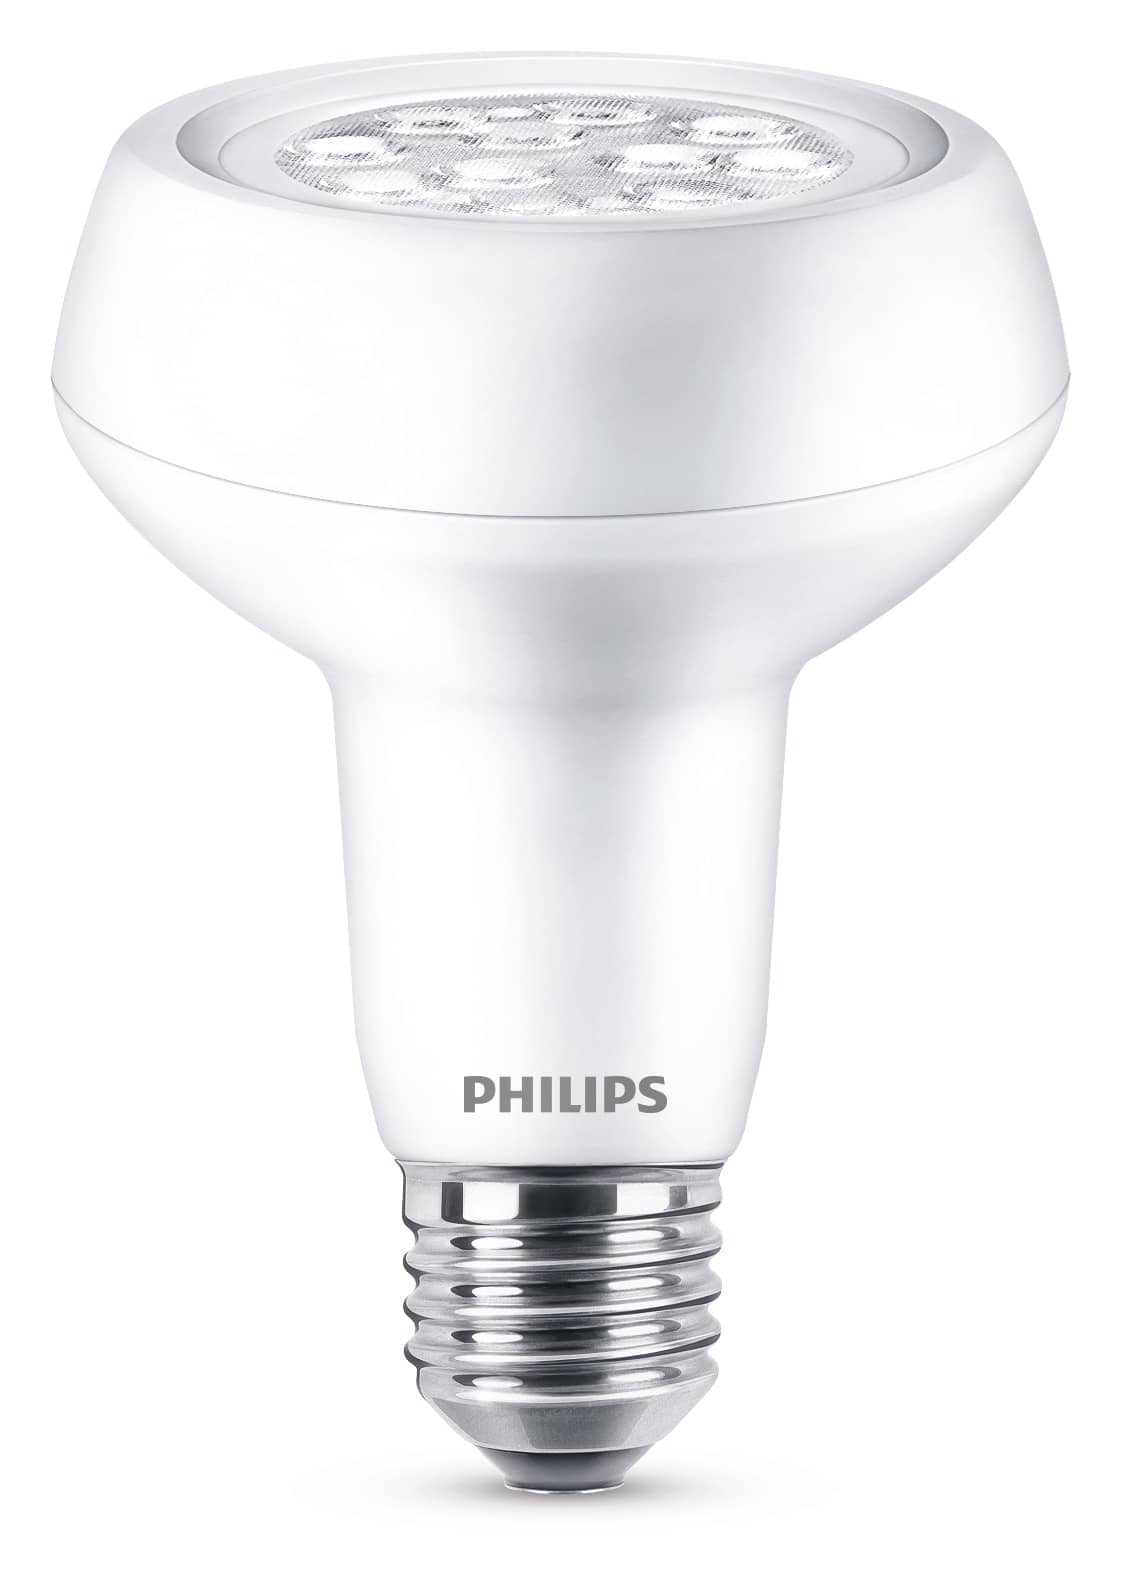 philips e27 r80 led reflektor 3 7w 360lm warmweiss. Black Bedroom Furniture Sets. Home Design Ideas